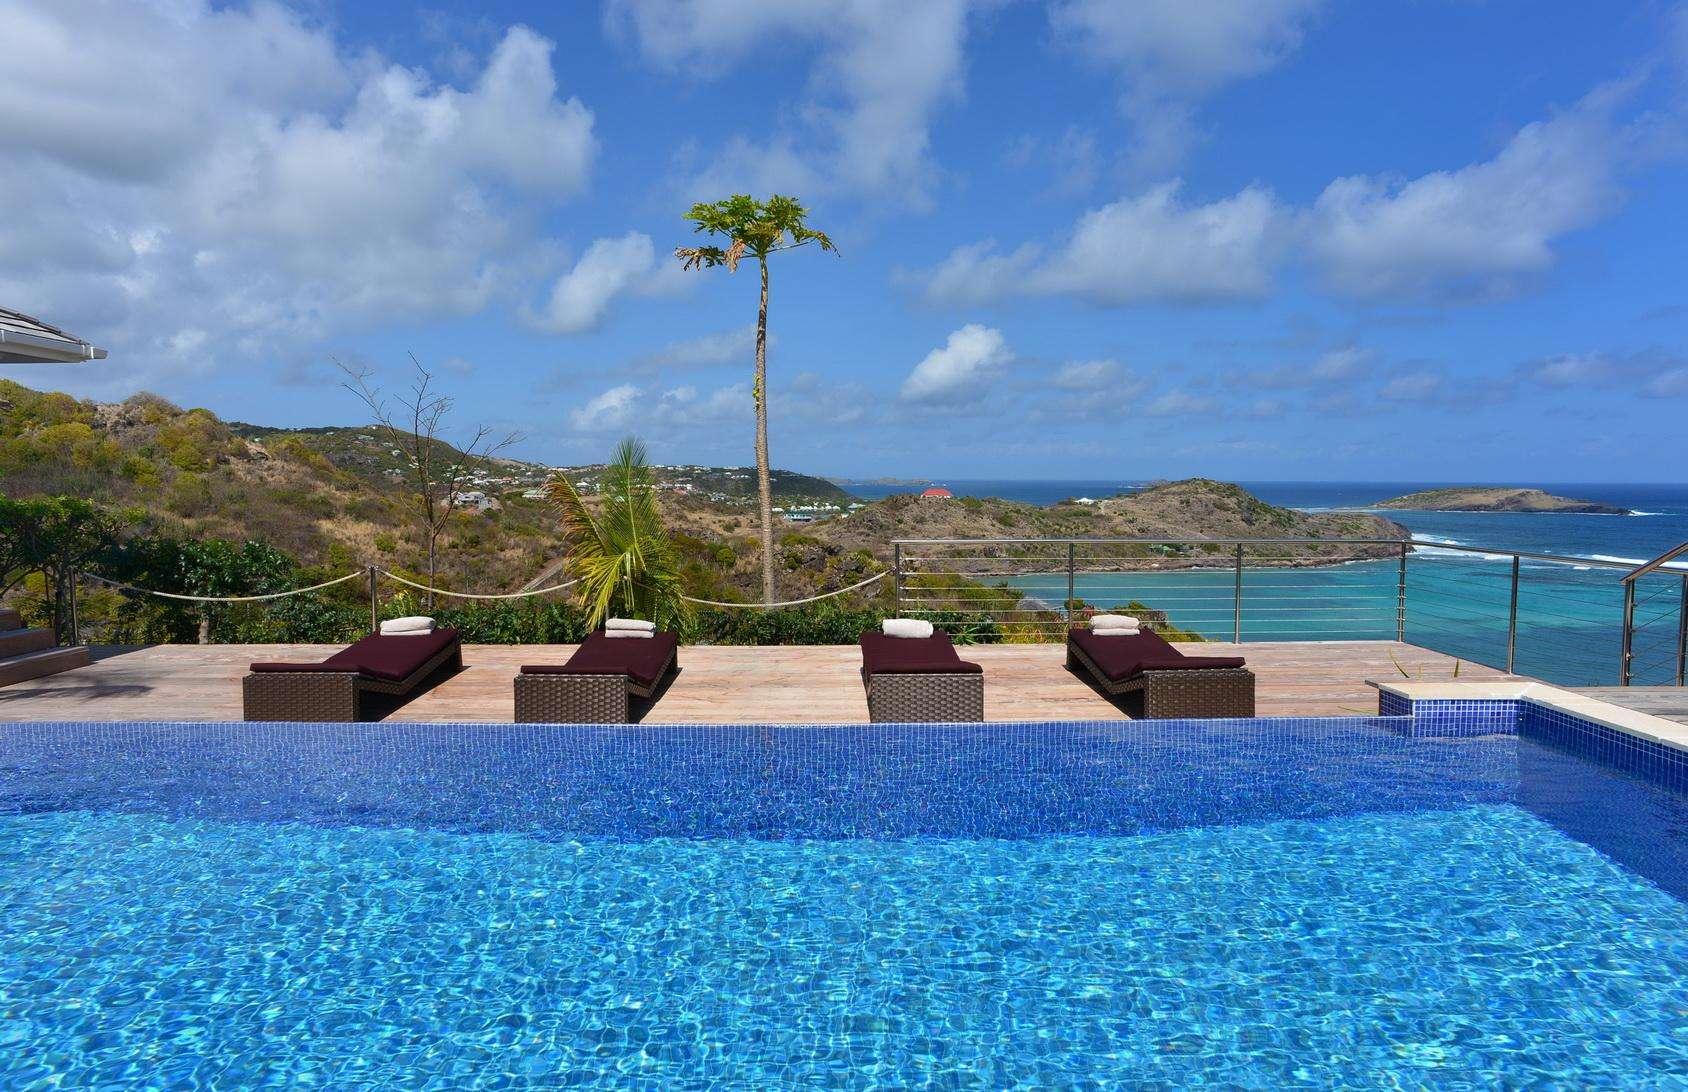 Luxury villa rentals caribbean - St barthelemy - Petit culdesac - Chambord - Image 1/22